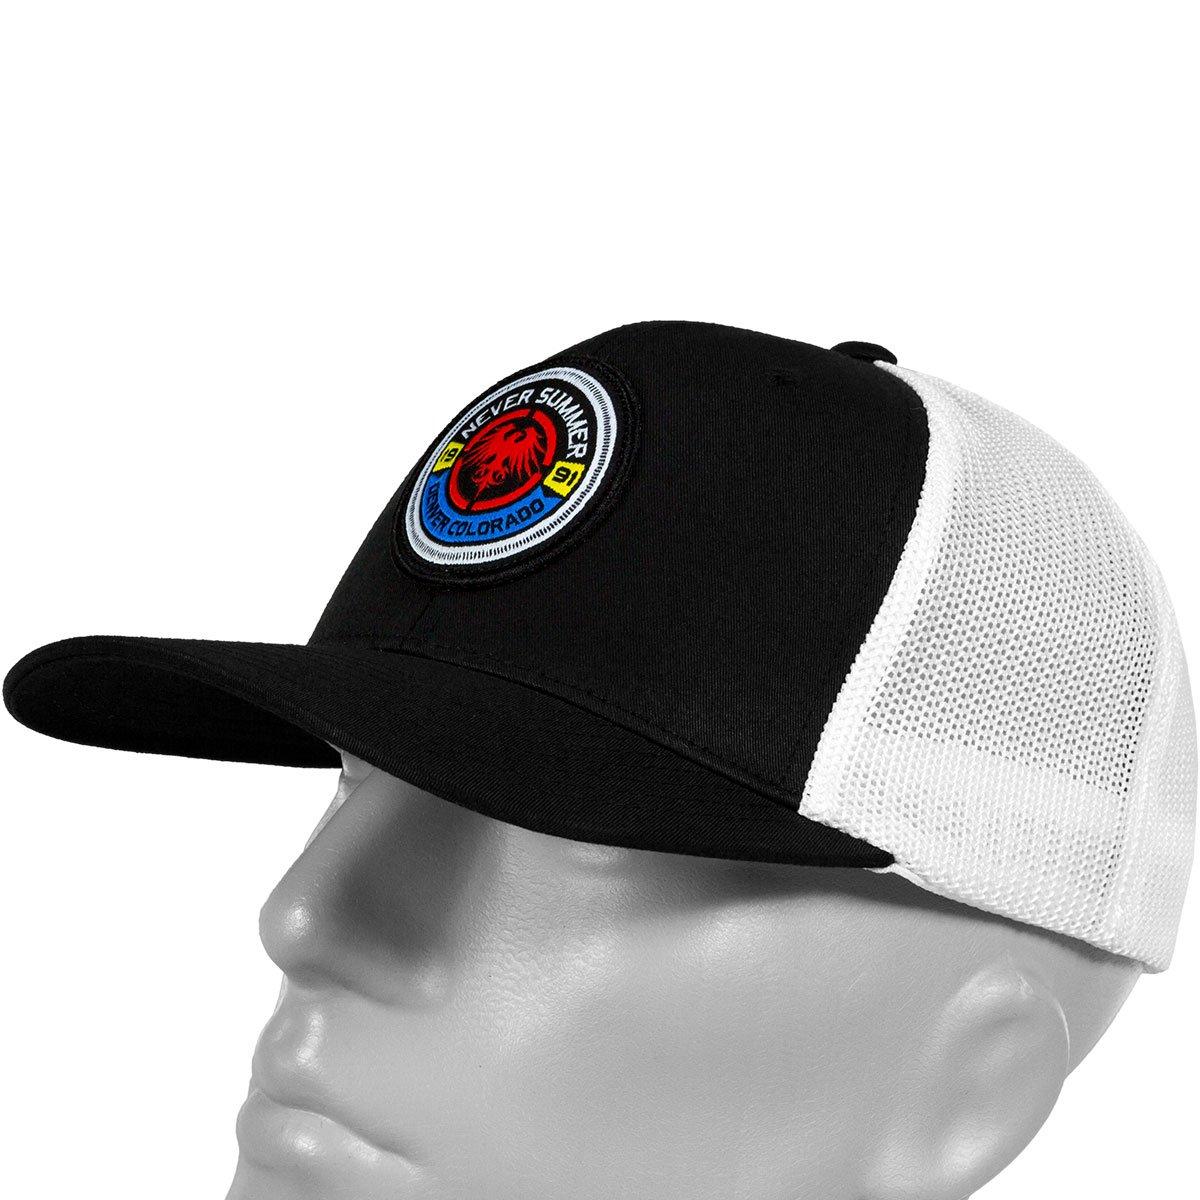 0f93364787191 Never Summer Bullet Eagle Flexfit Trucker Hat at Amazon Men s Clothing  store